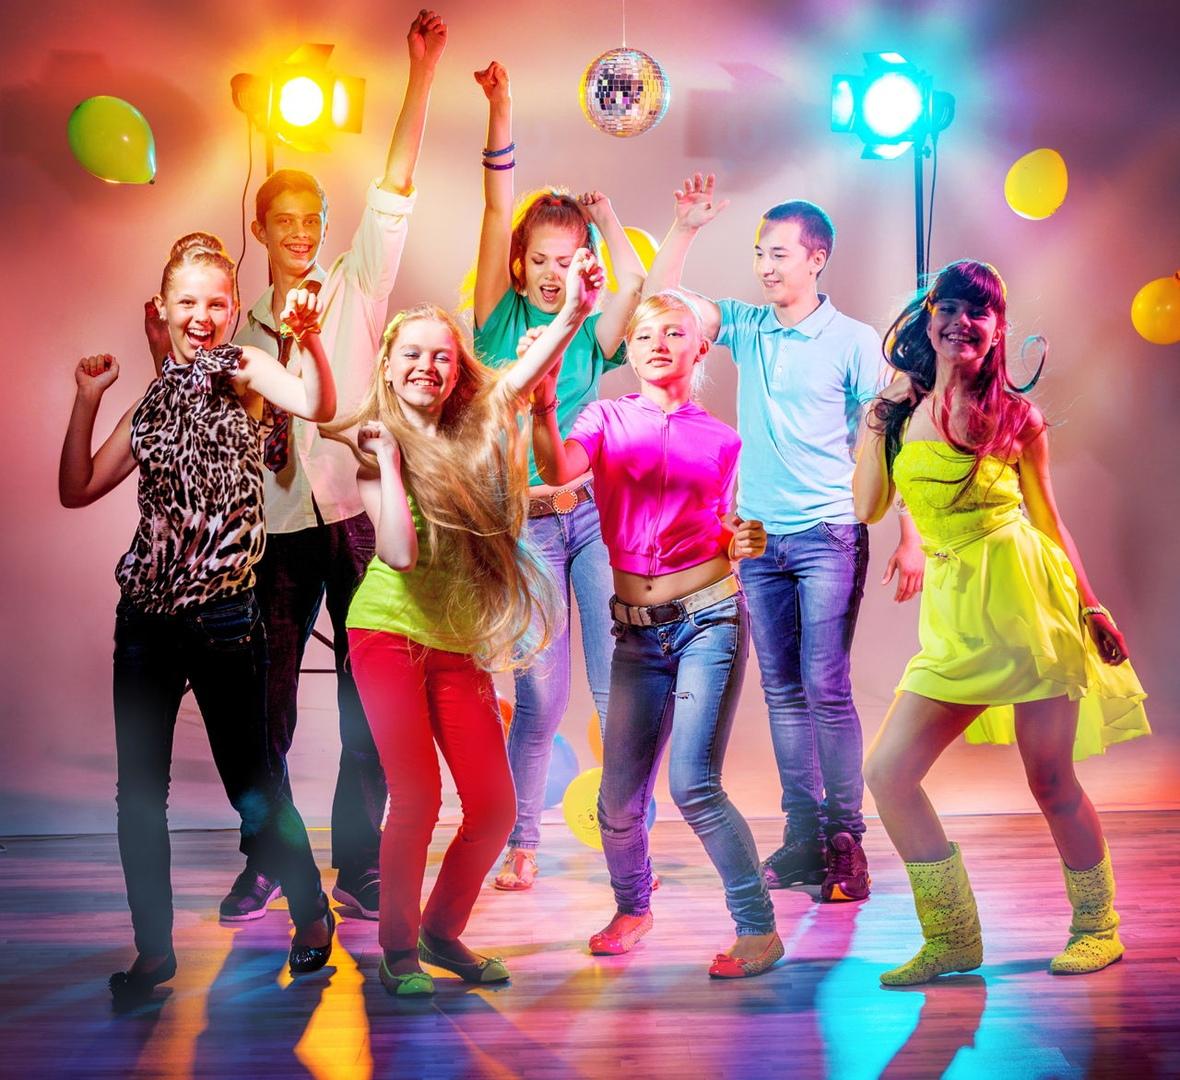 Молодежь танцует картинки